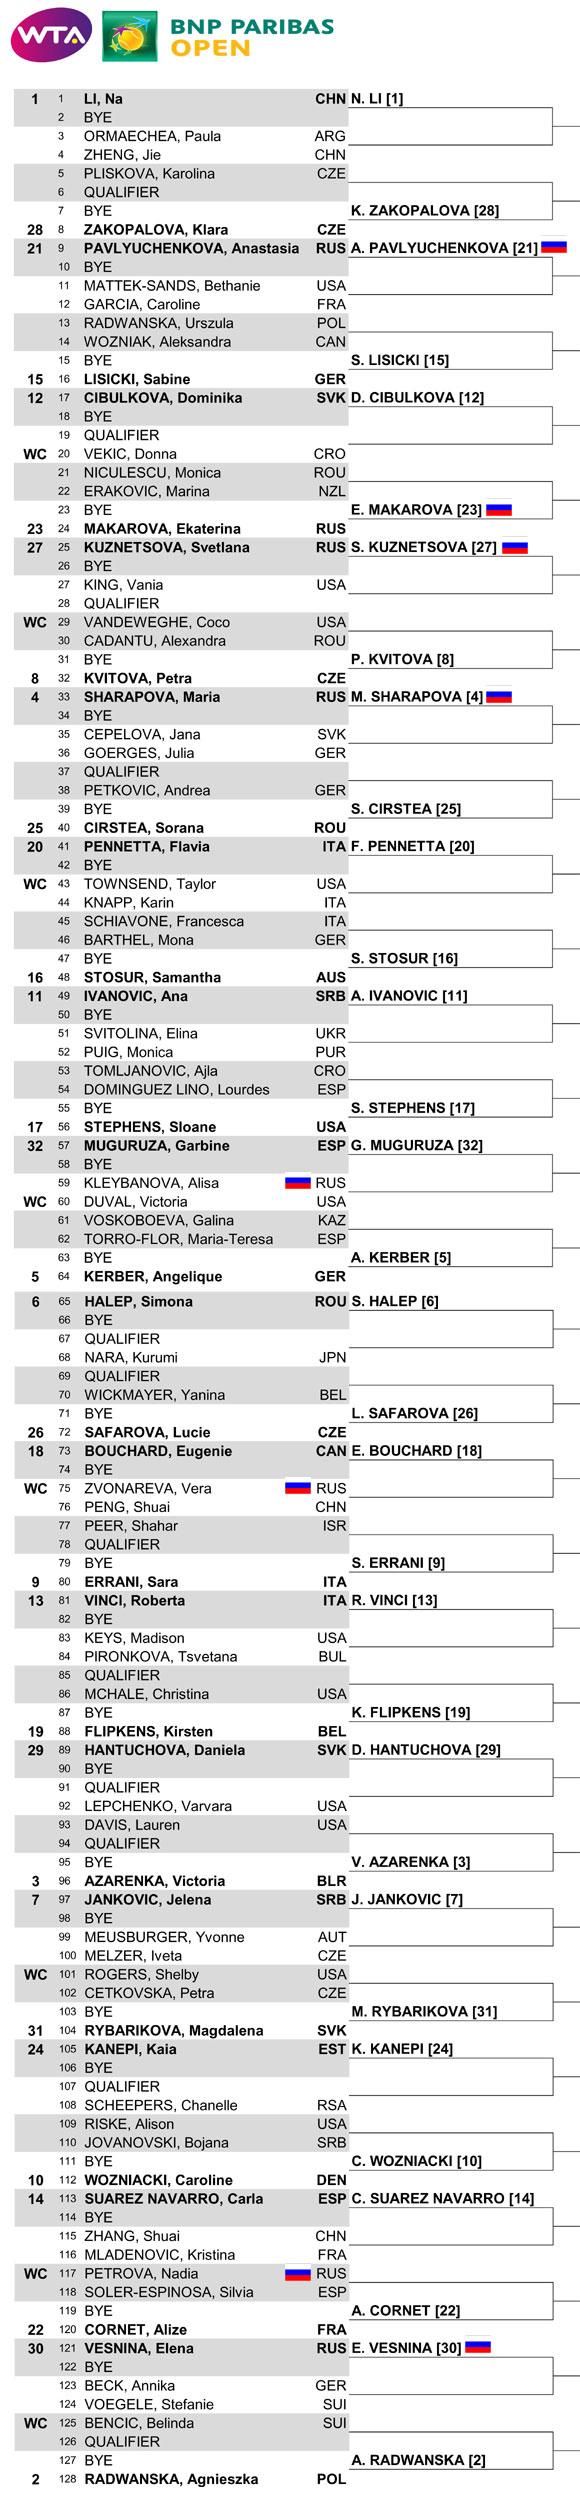 Итоги жеребьевки на турнире WTA BNP Paribas Open в Индиан-Уэллсе